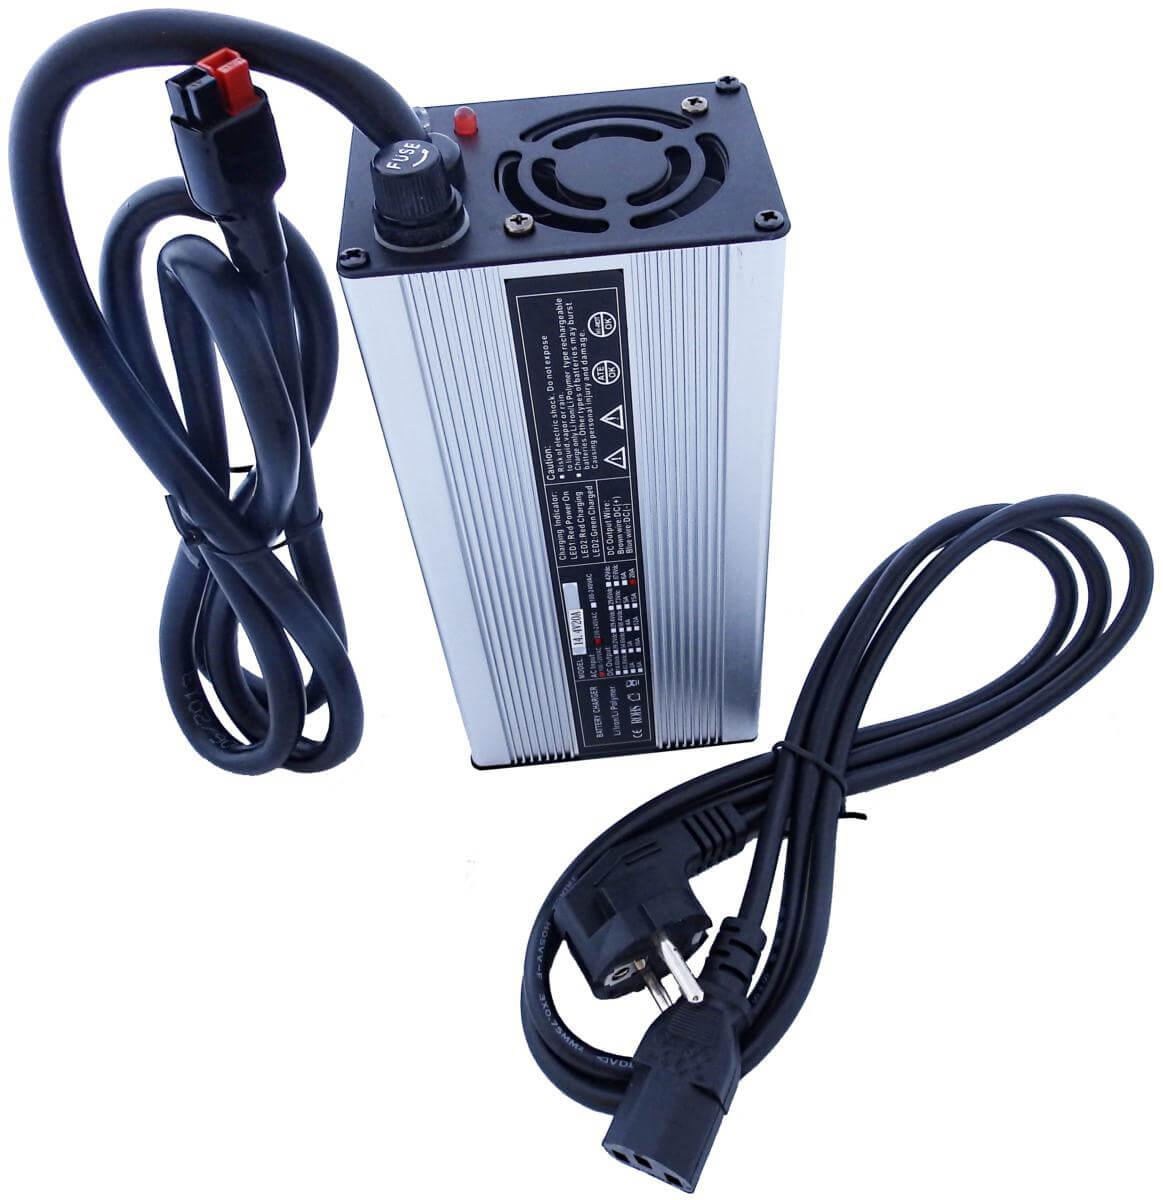 Chargeur pour valise lithium 25,2V 18A